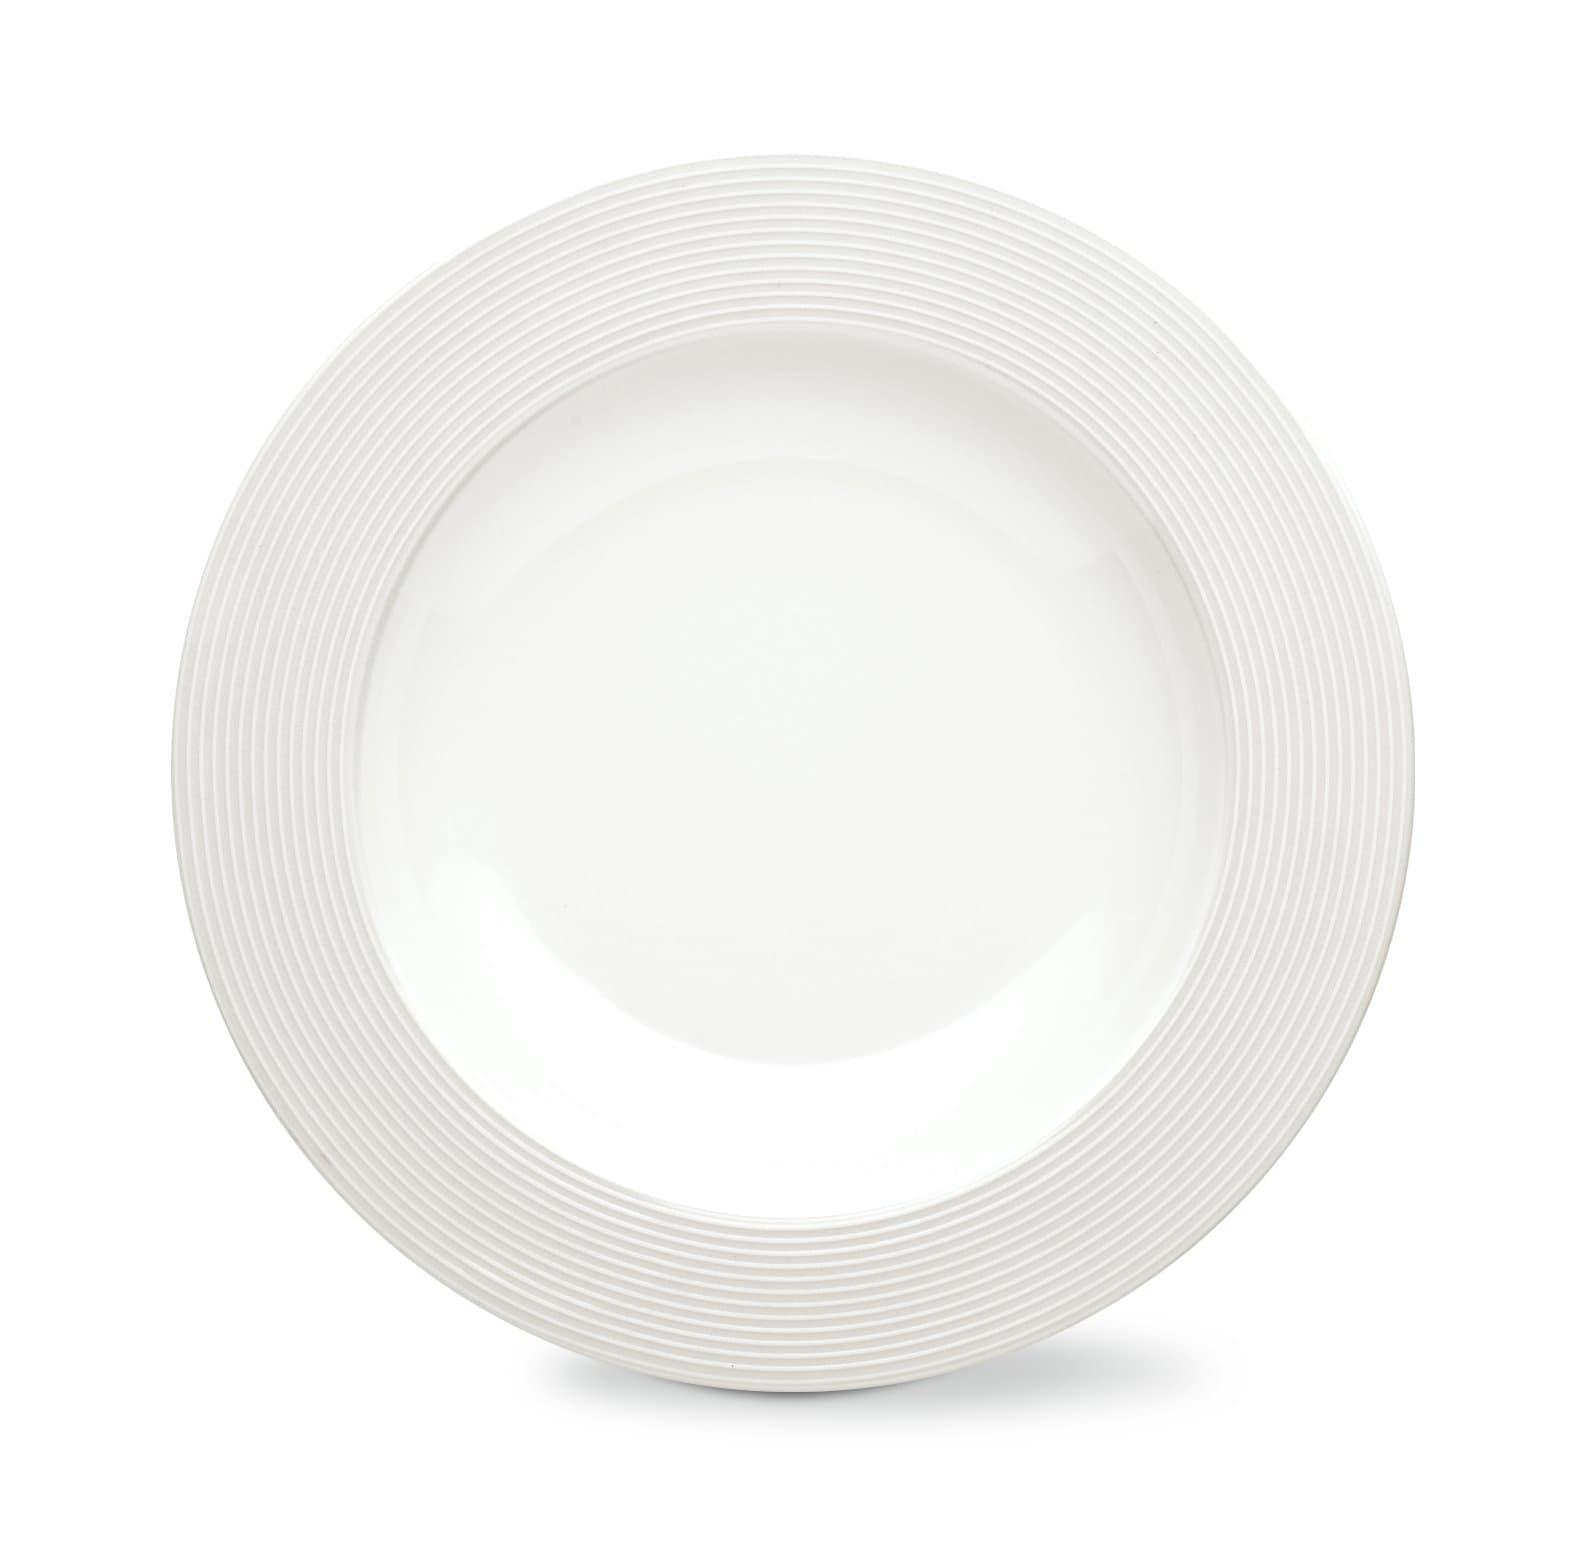 Cucina & Tavola VIENNA Assiette creuse